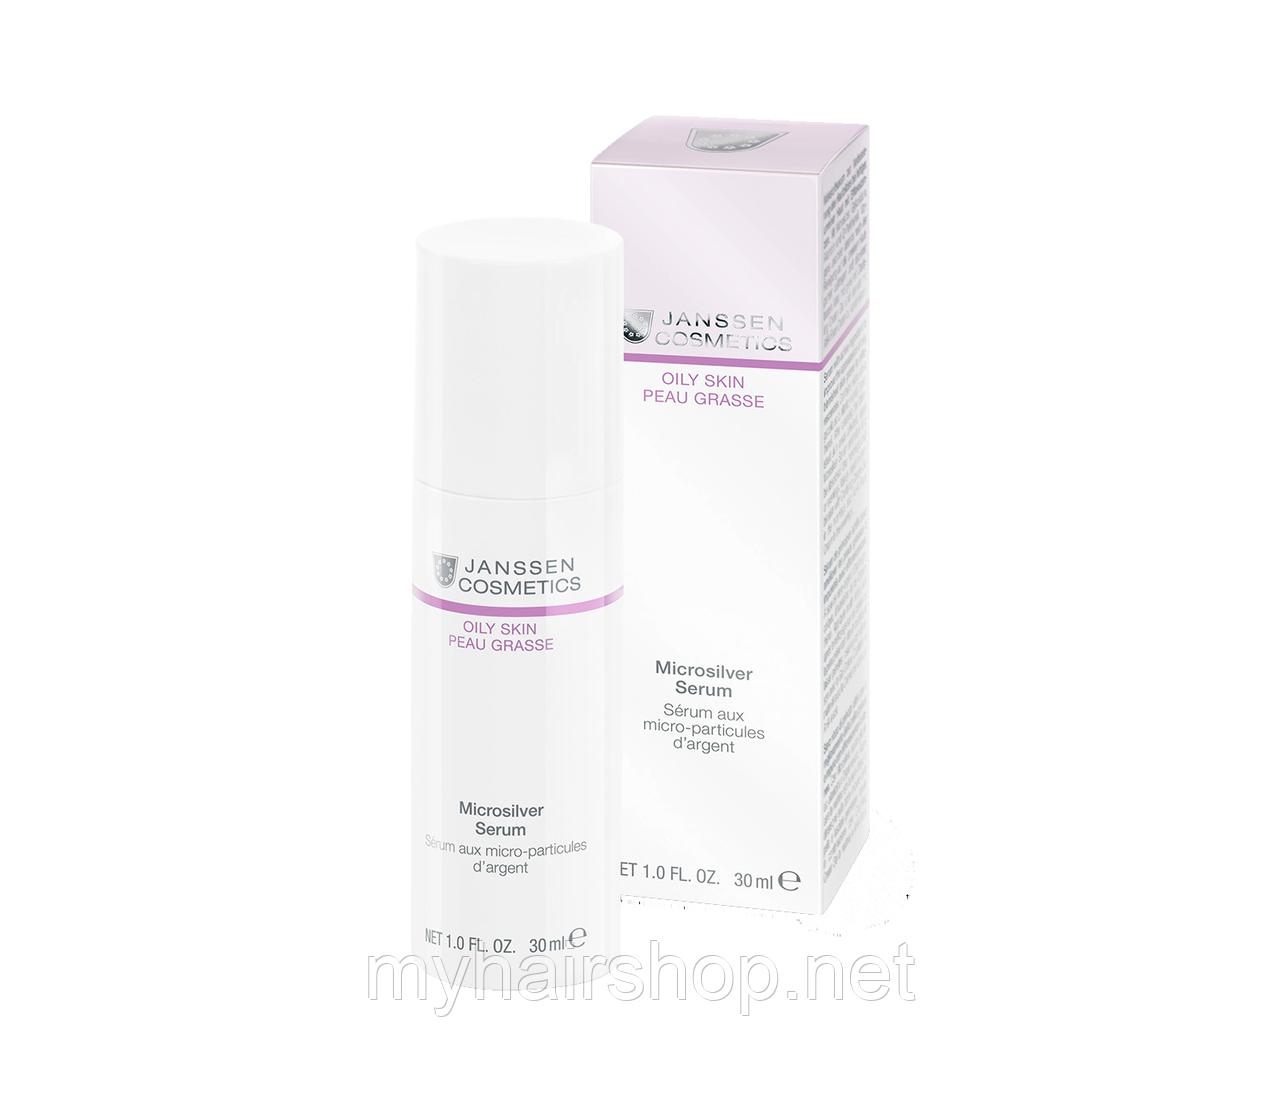 Антибактеріальна сироватка JANSSEN Oily Skin Microsilver Serum 30 мл